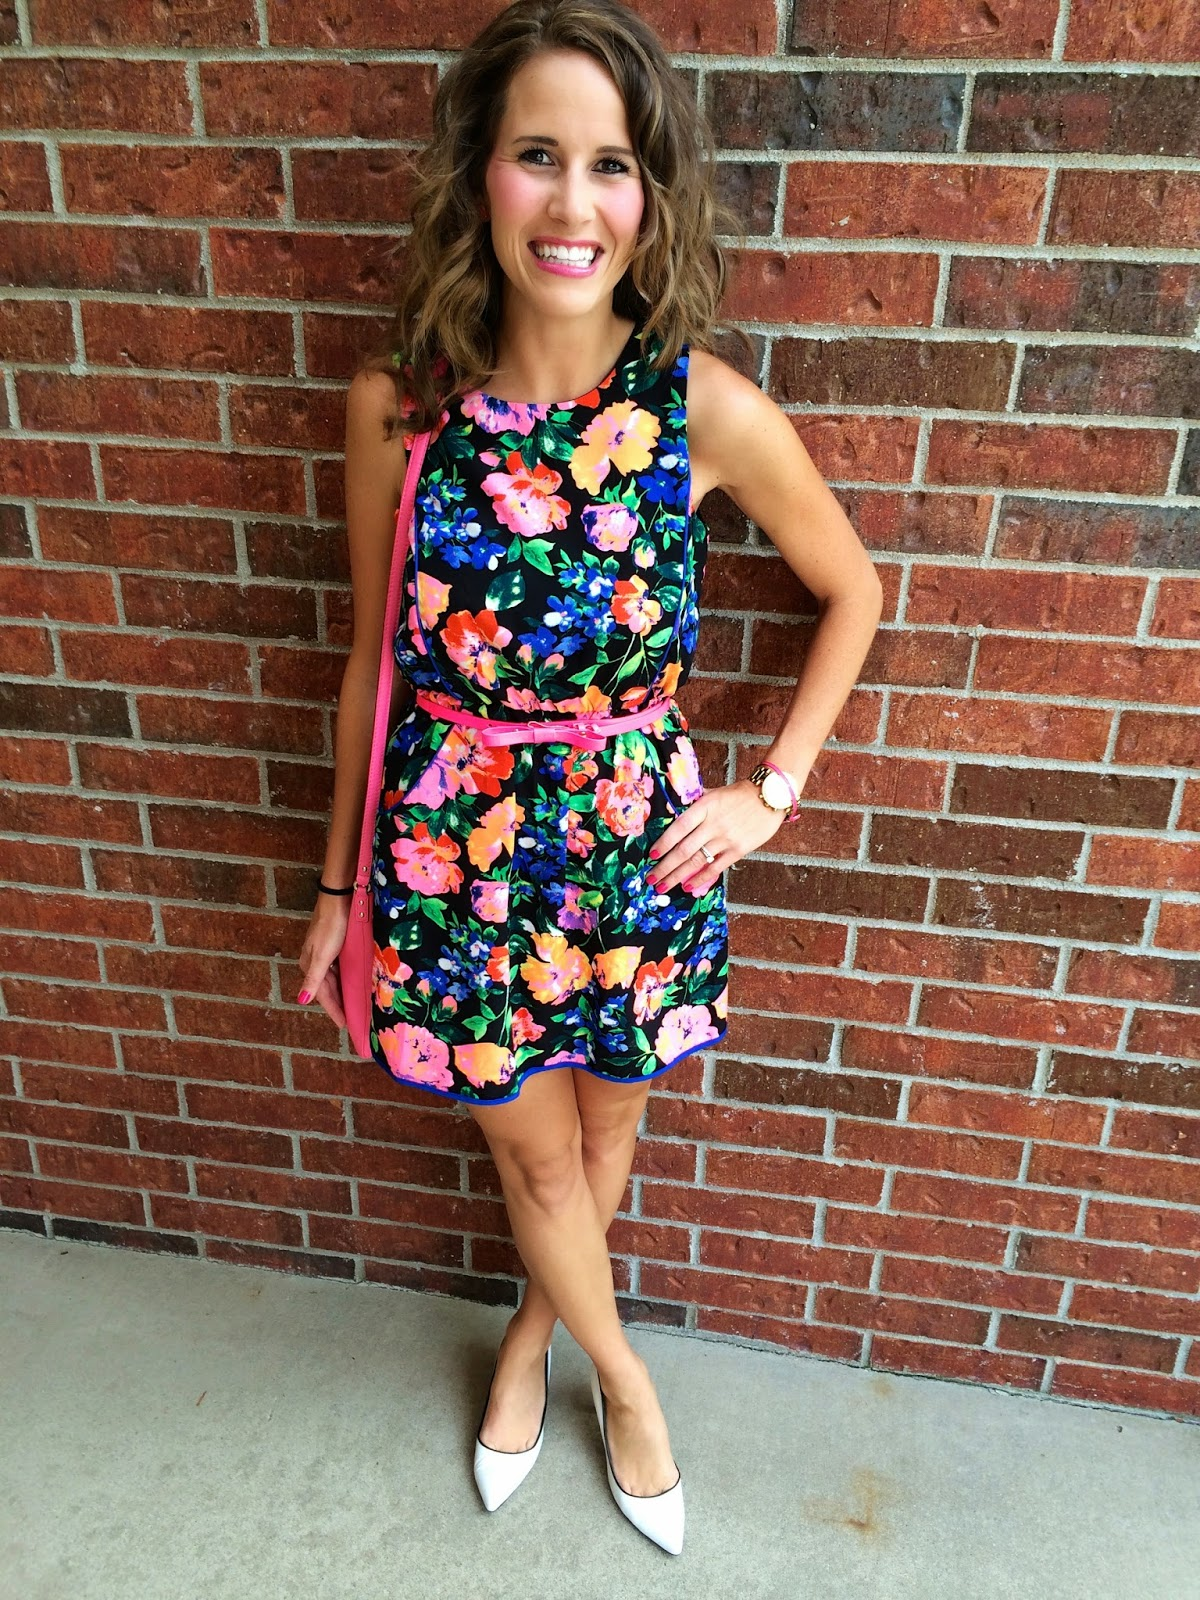 e77fd78041a Hooray for little fashion surprises   hot pink bow belts! Dress  TJ Maxx  Belt  Kate Spade Earrings  Kate Spade Shoes  Steve Madden